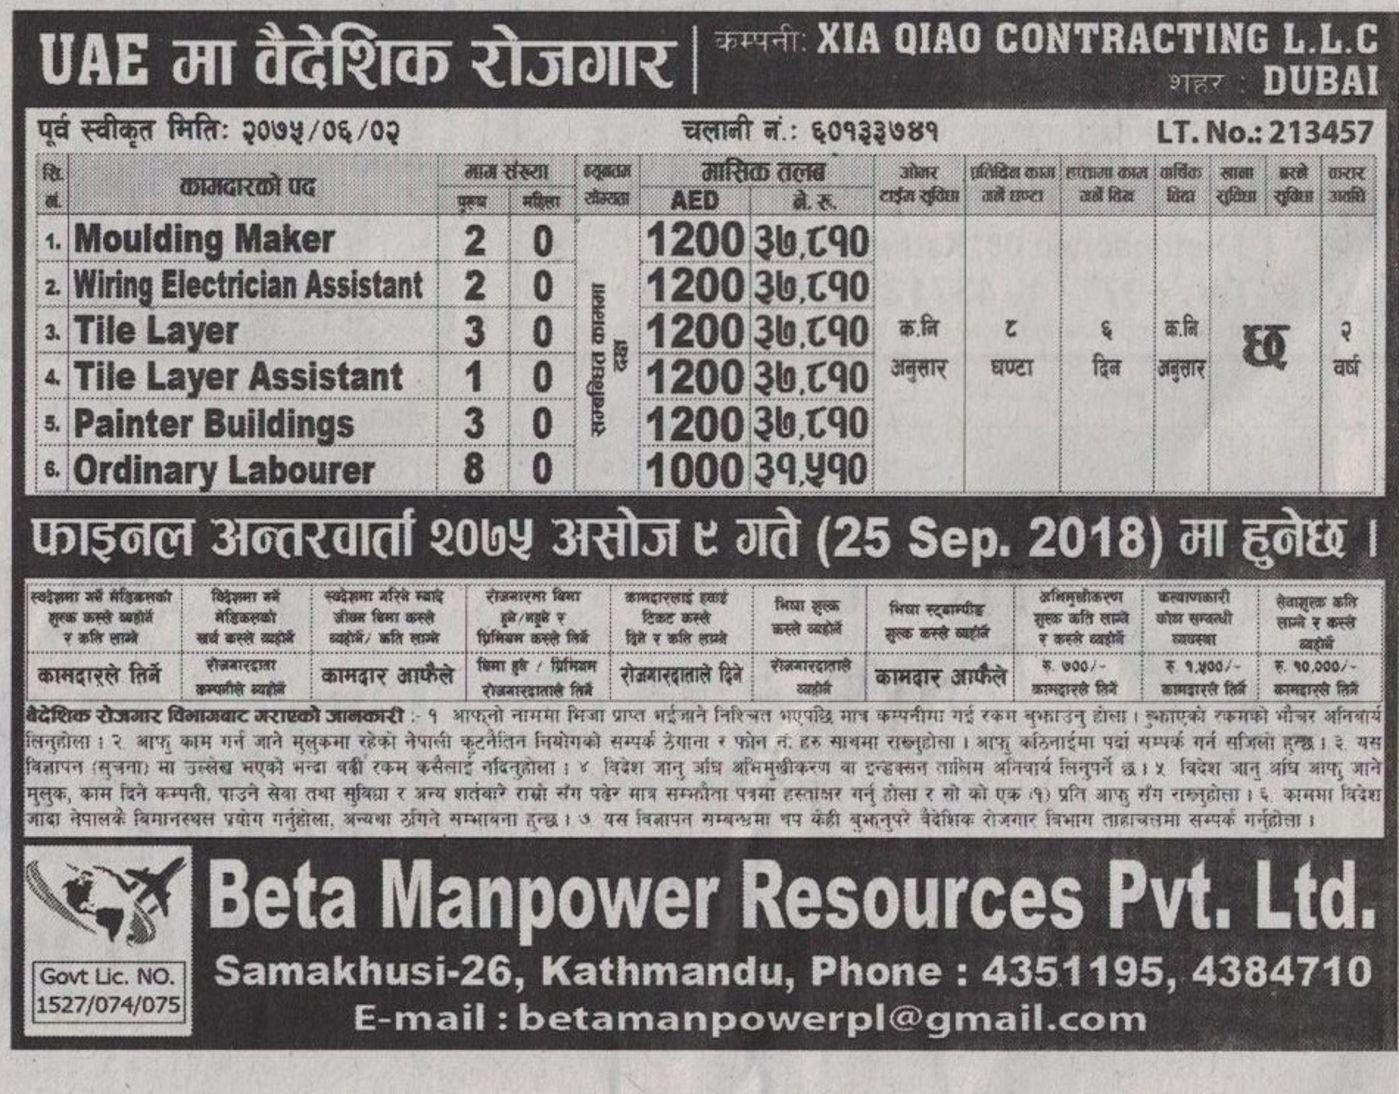 Jobs Nepal - UAE Vacancy - Painter, Tile Layer, Electrician